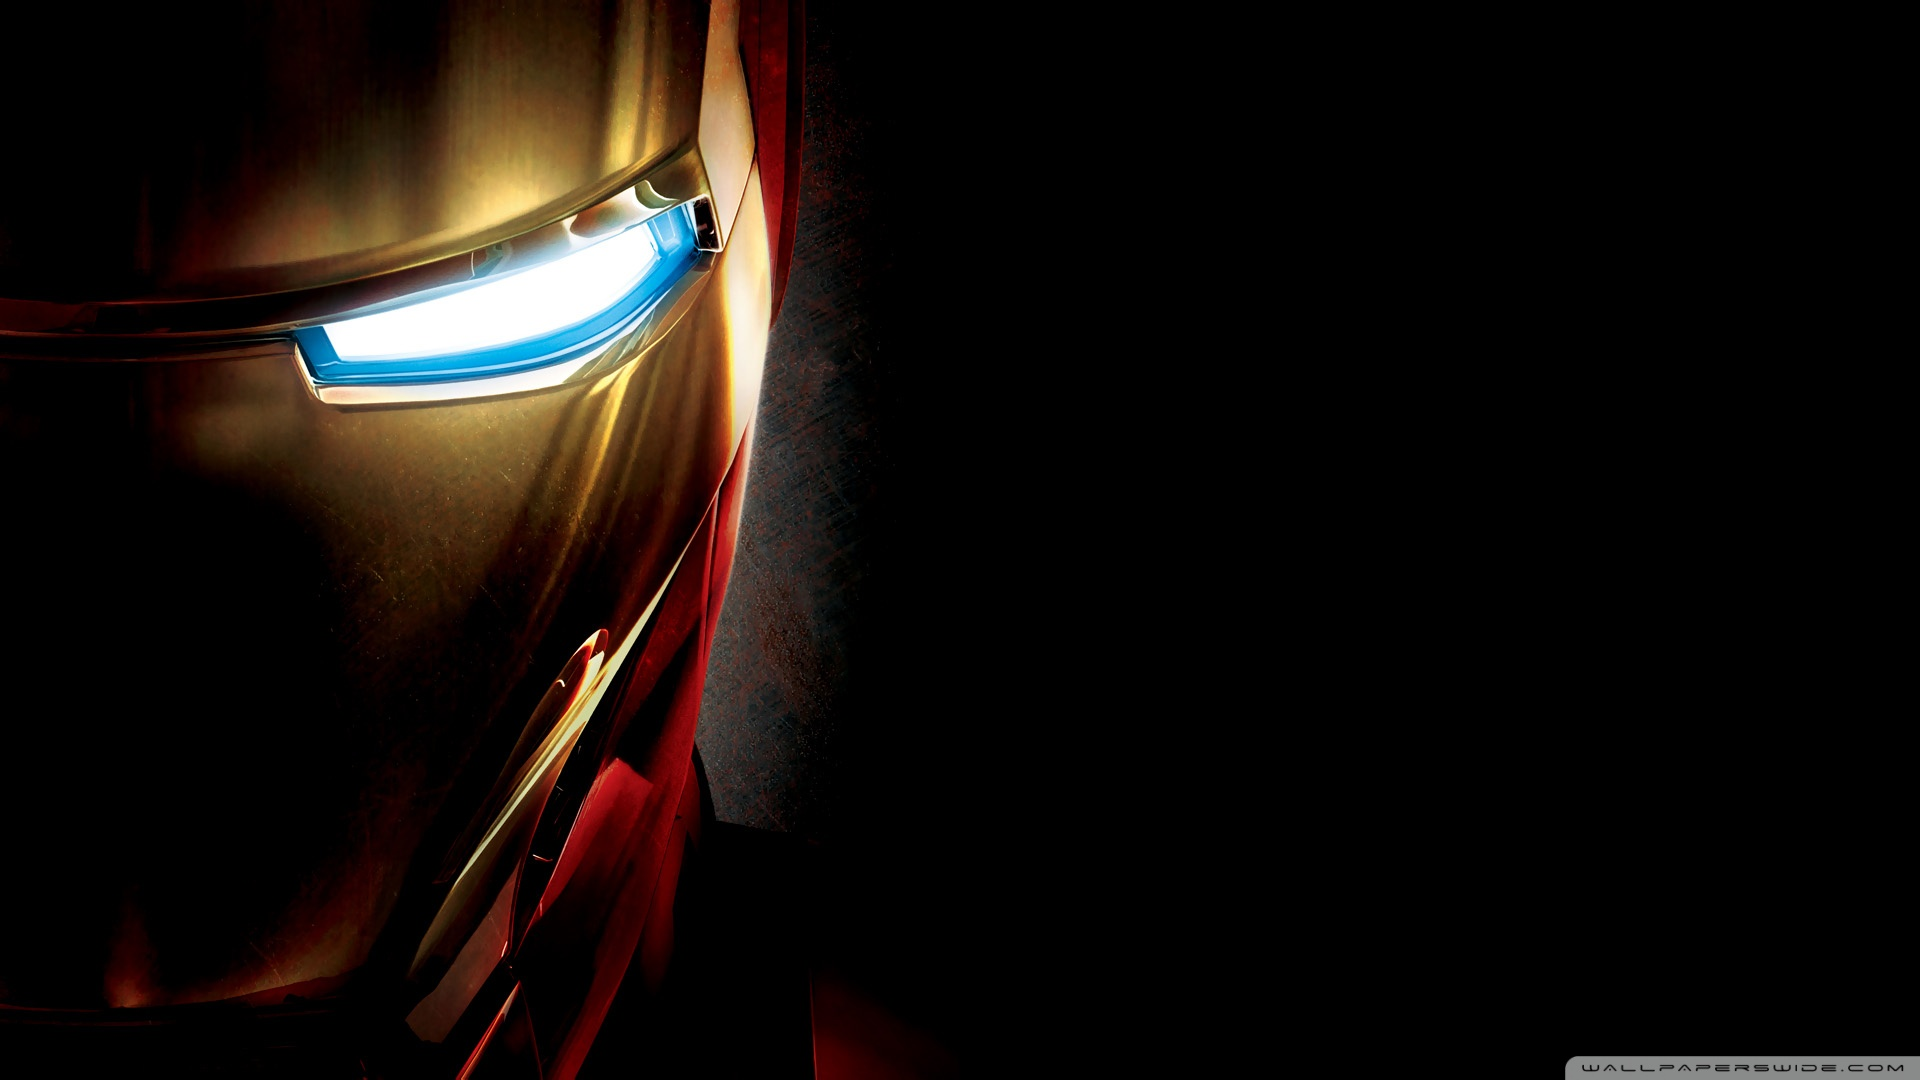 Iron Man Eye wallpaper